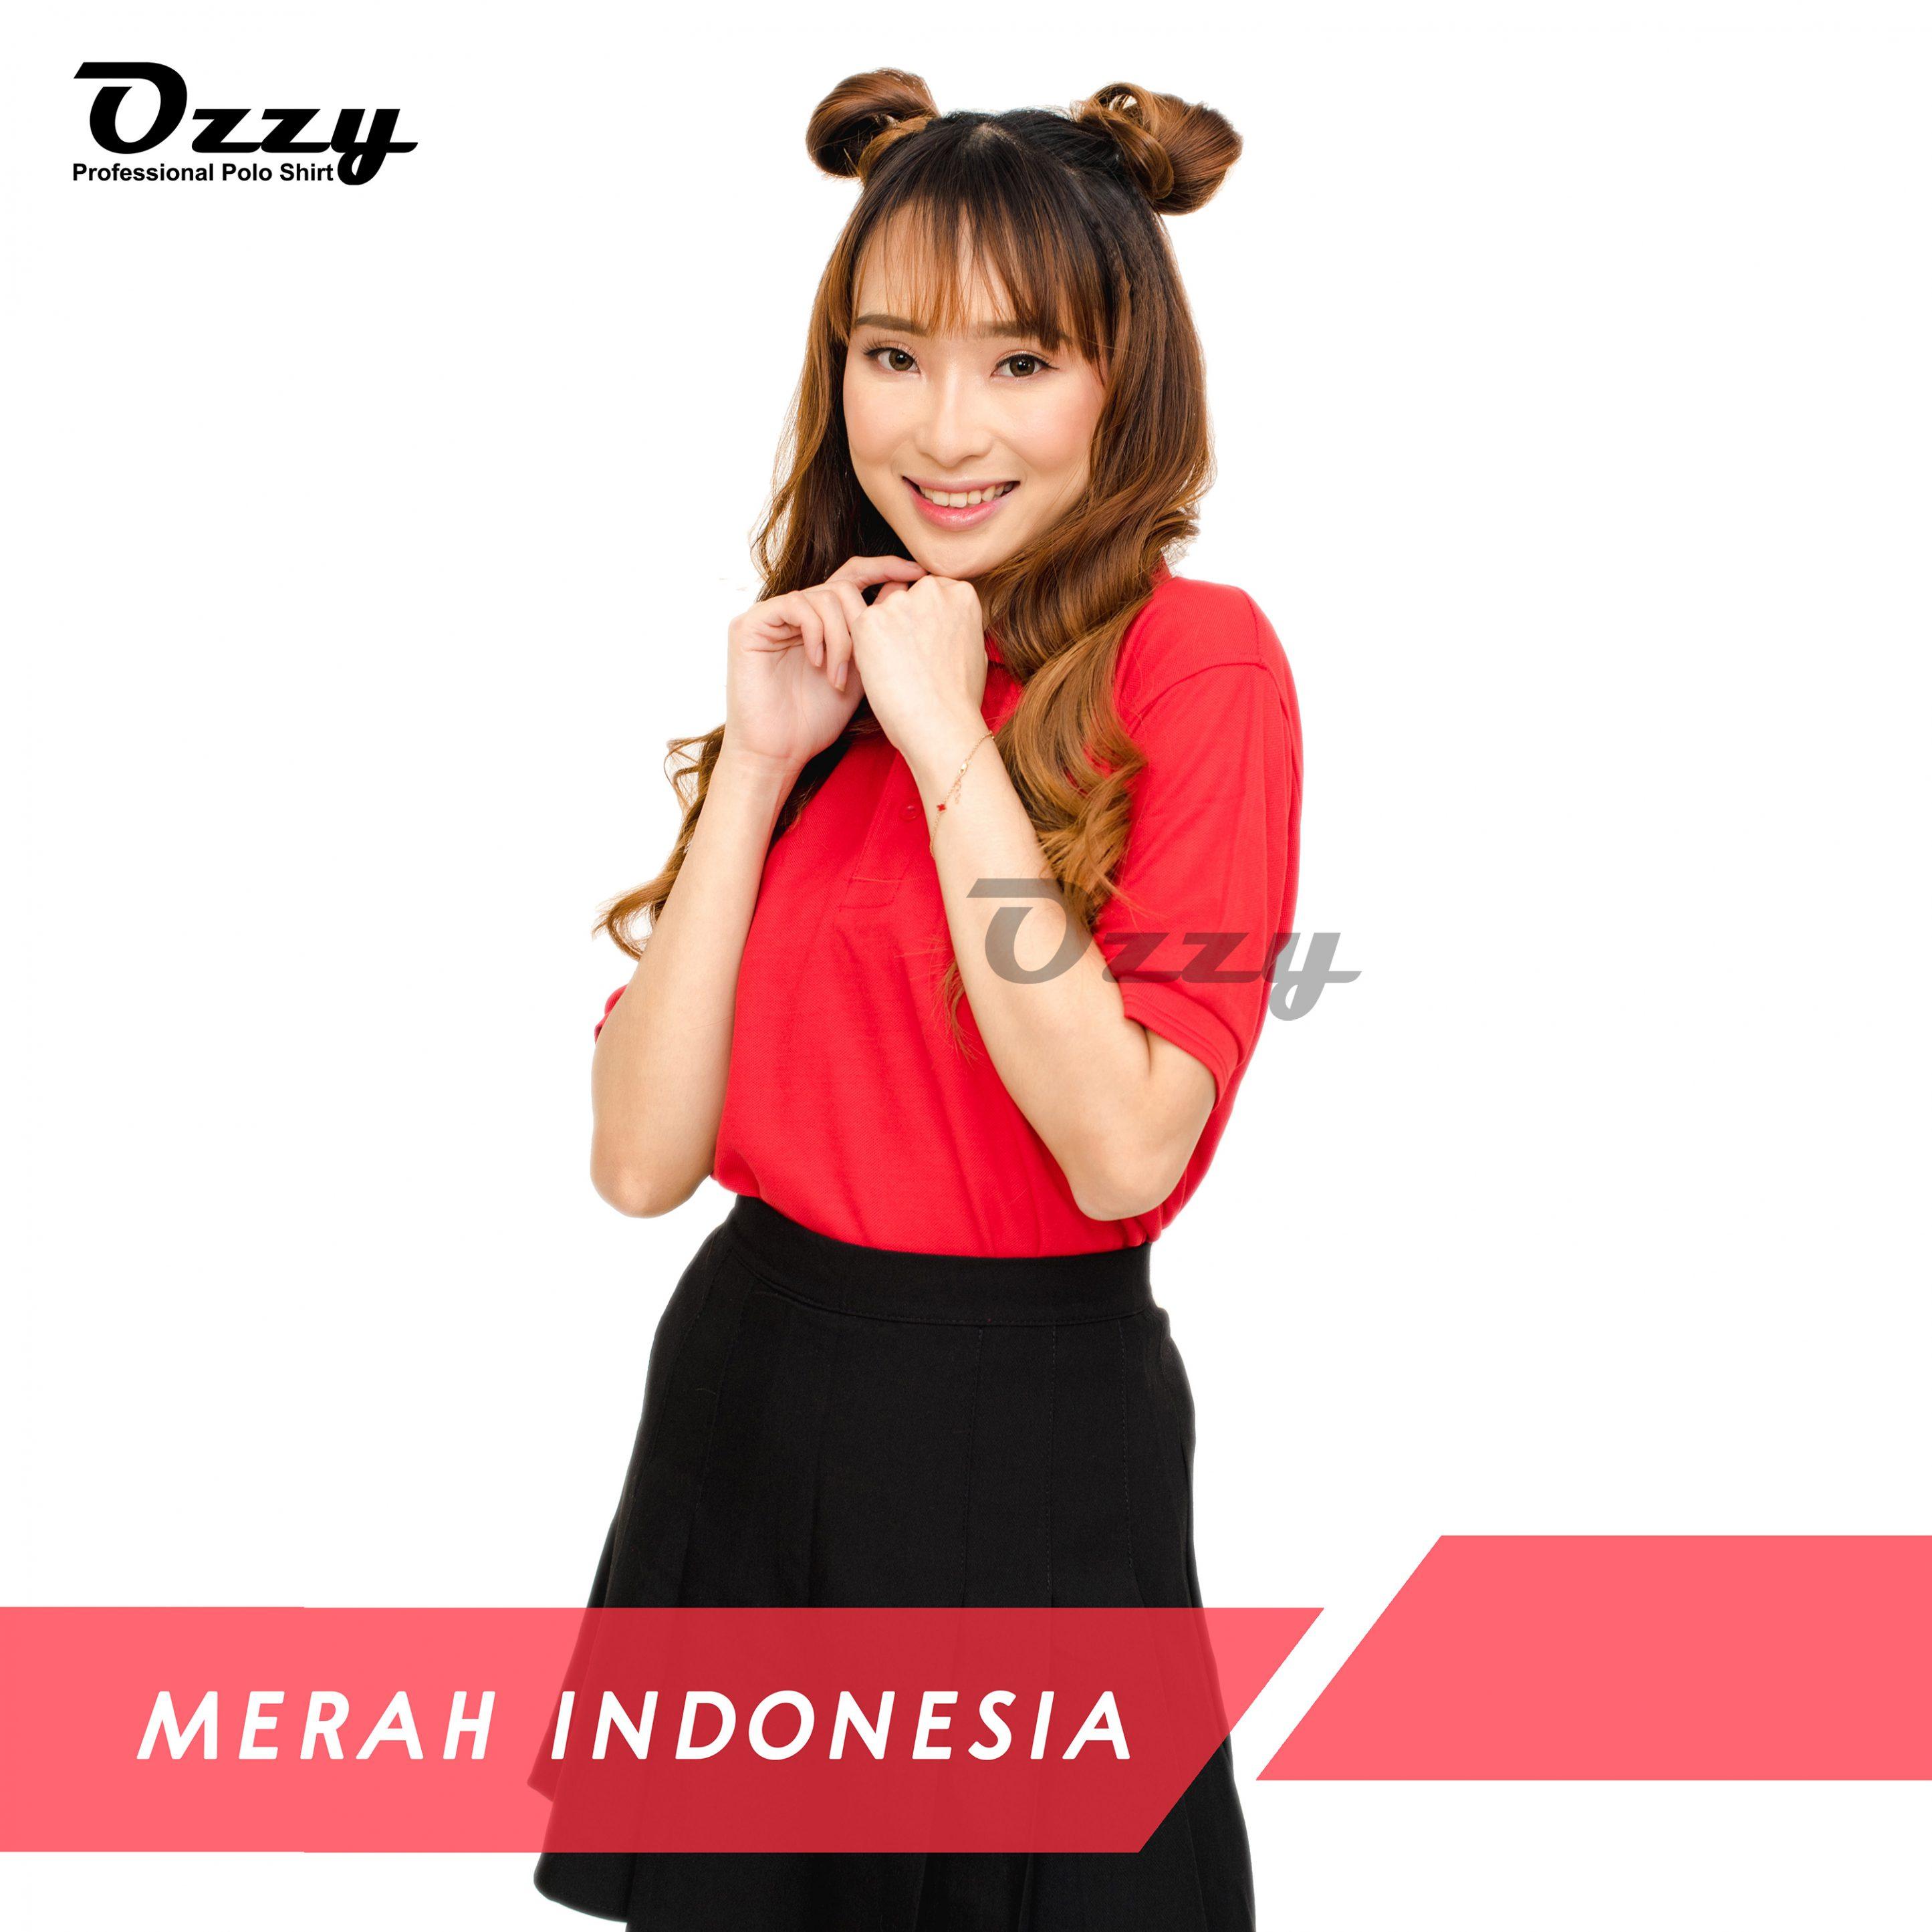 KAOS POLO JOGJA - MERAH INDONESIA (1-1)